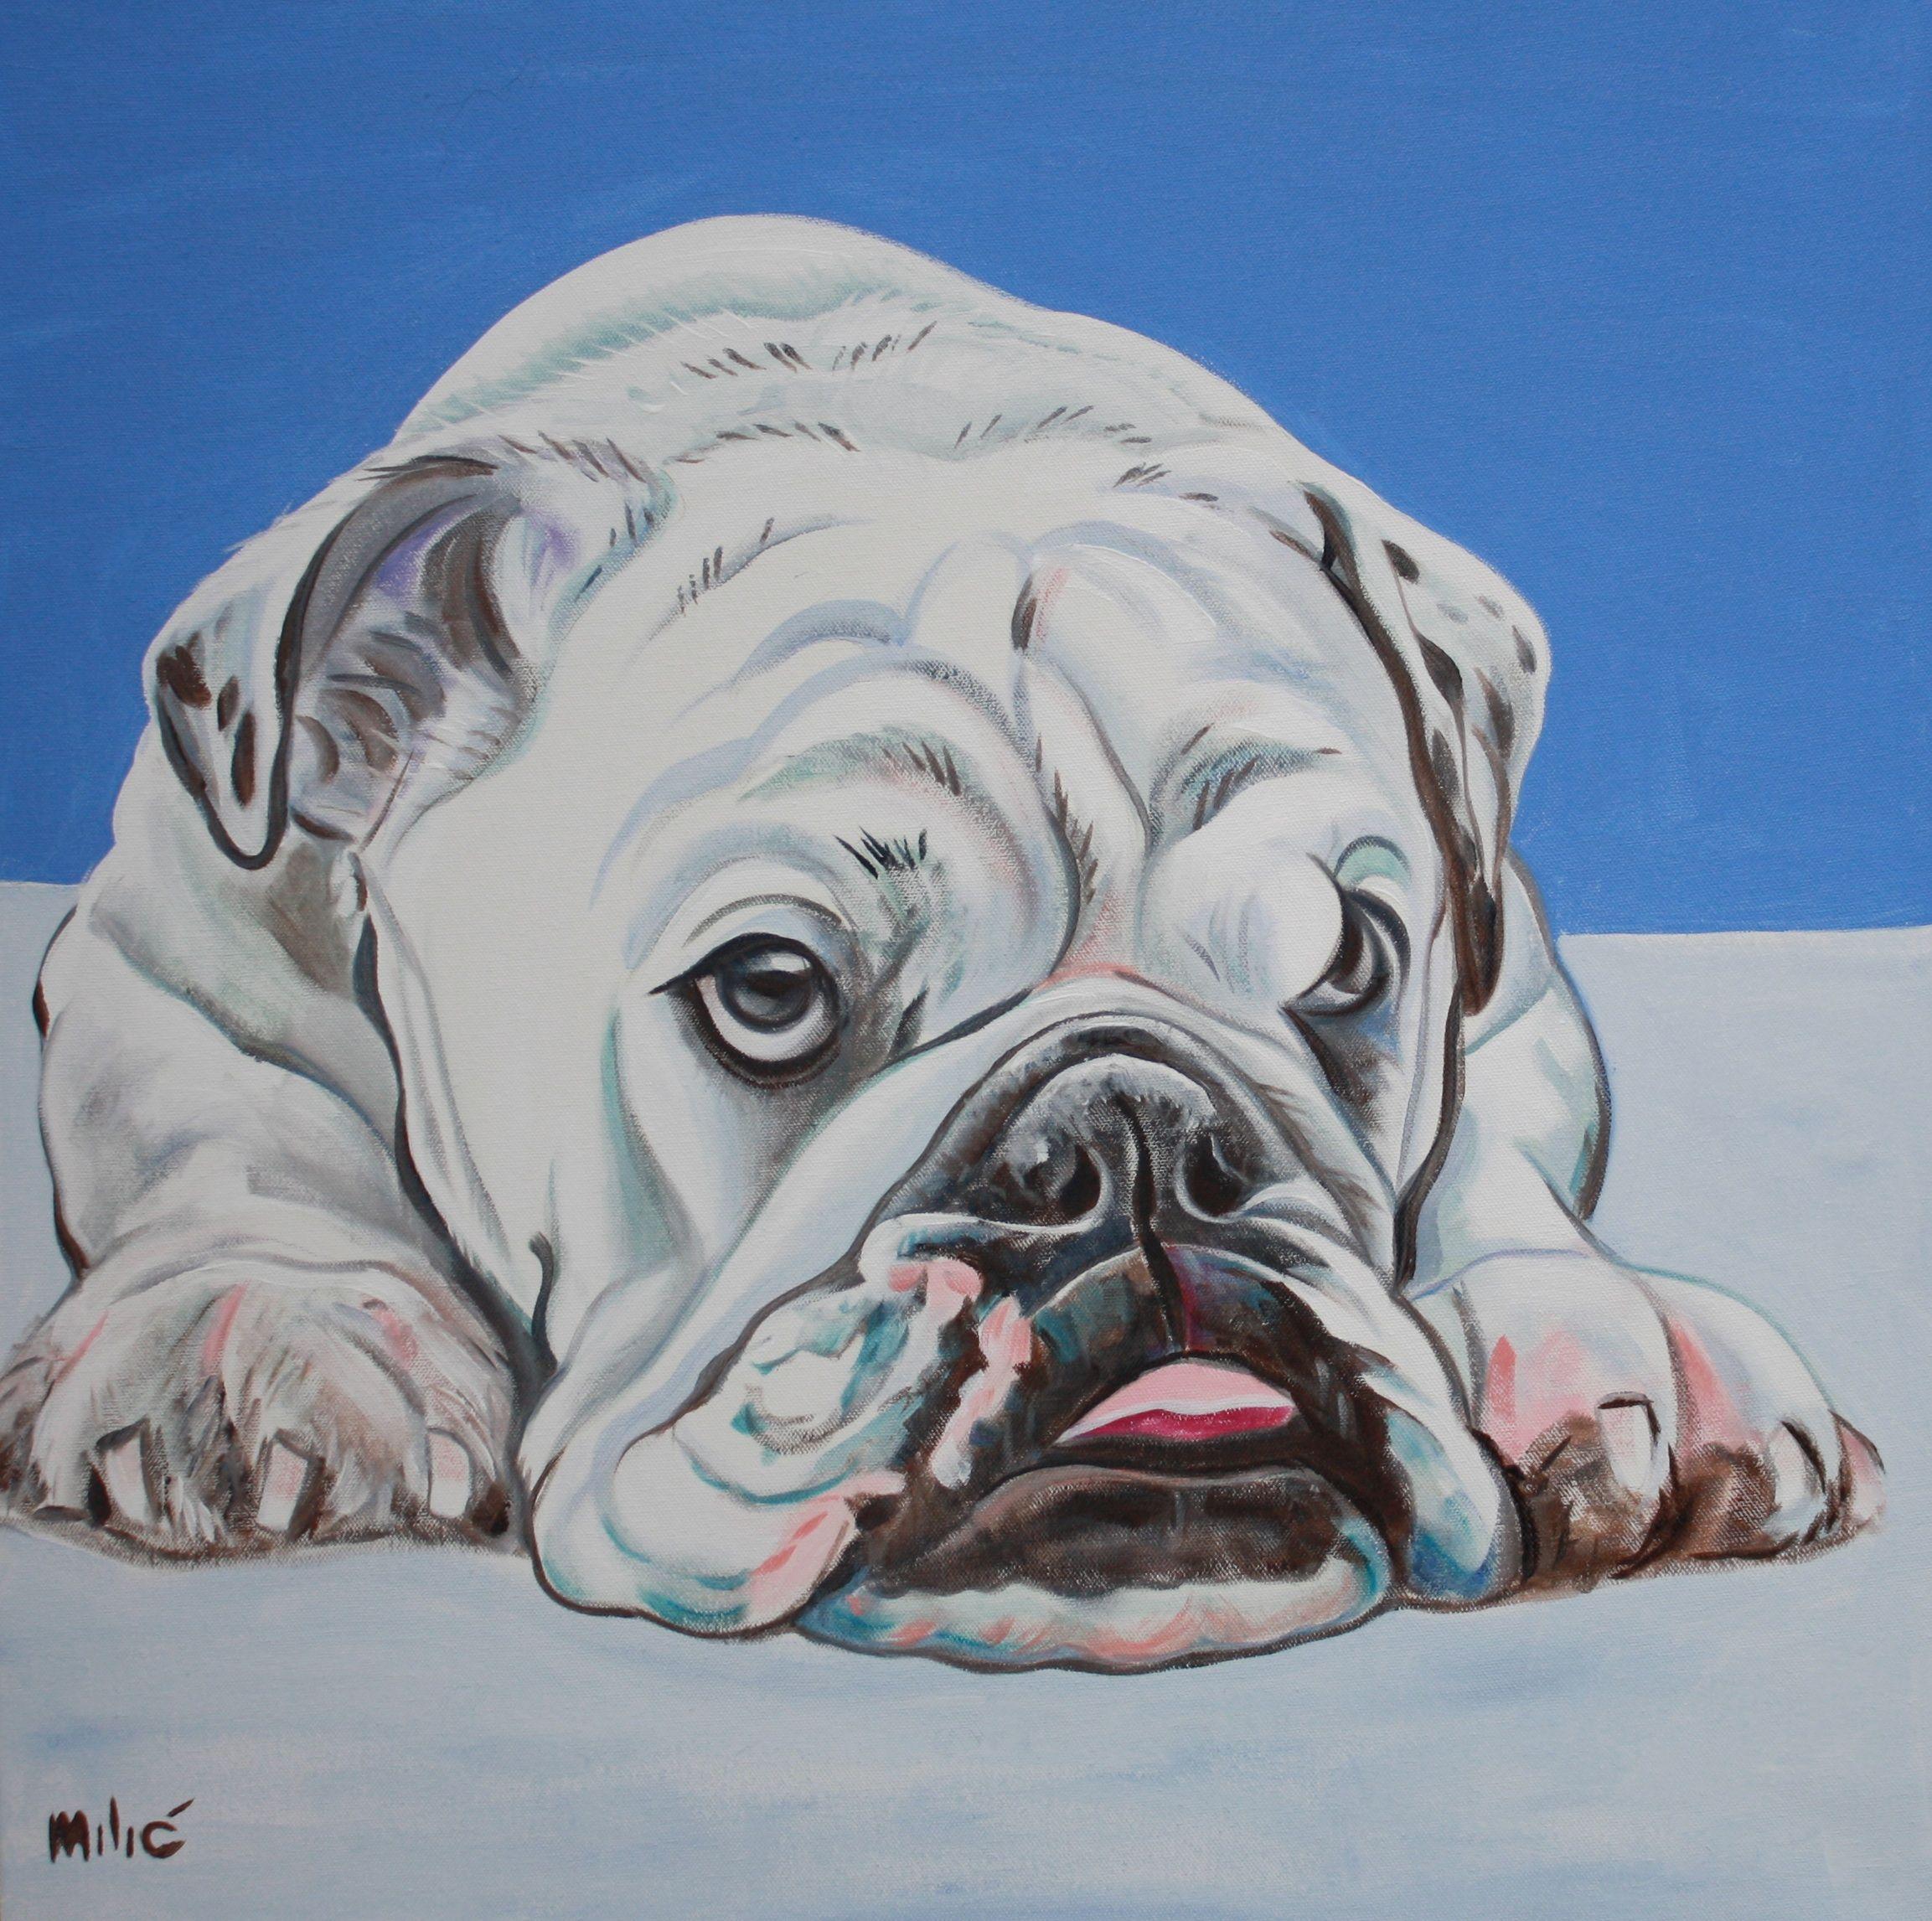 "toni soprano 24x24"" oil on canvas by dragoslav drago milic"